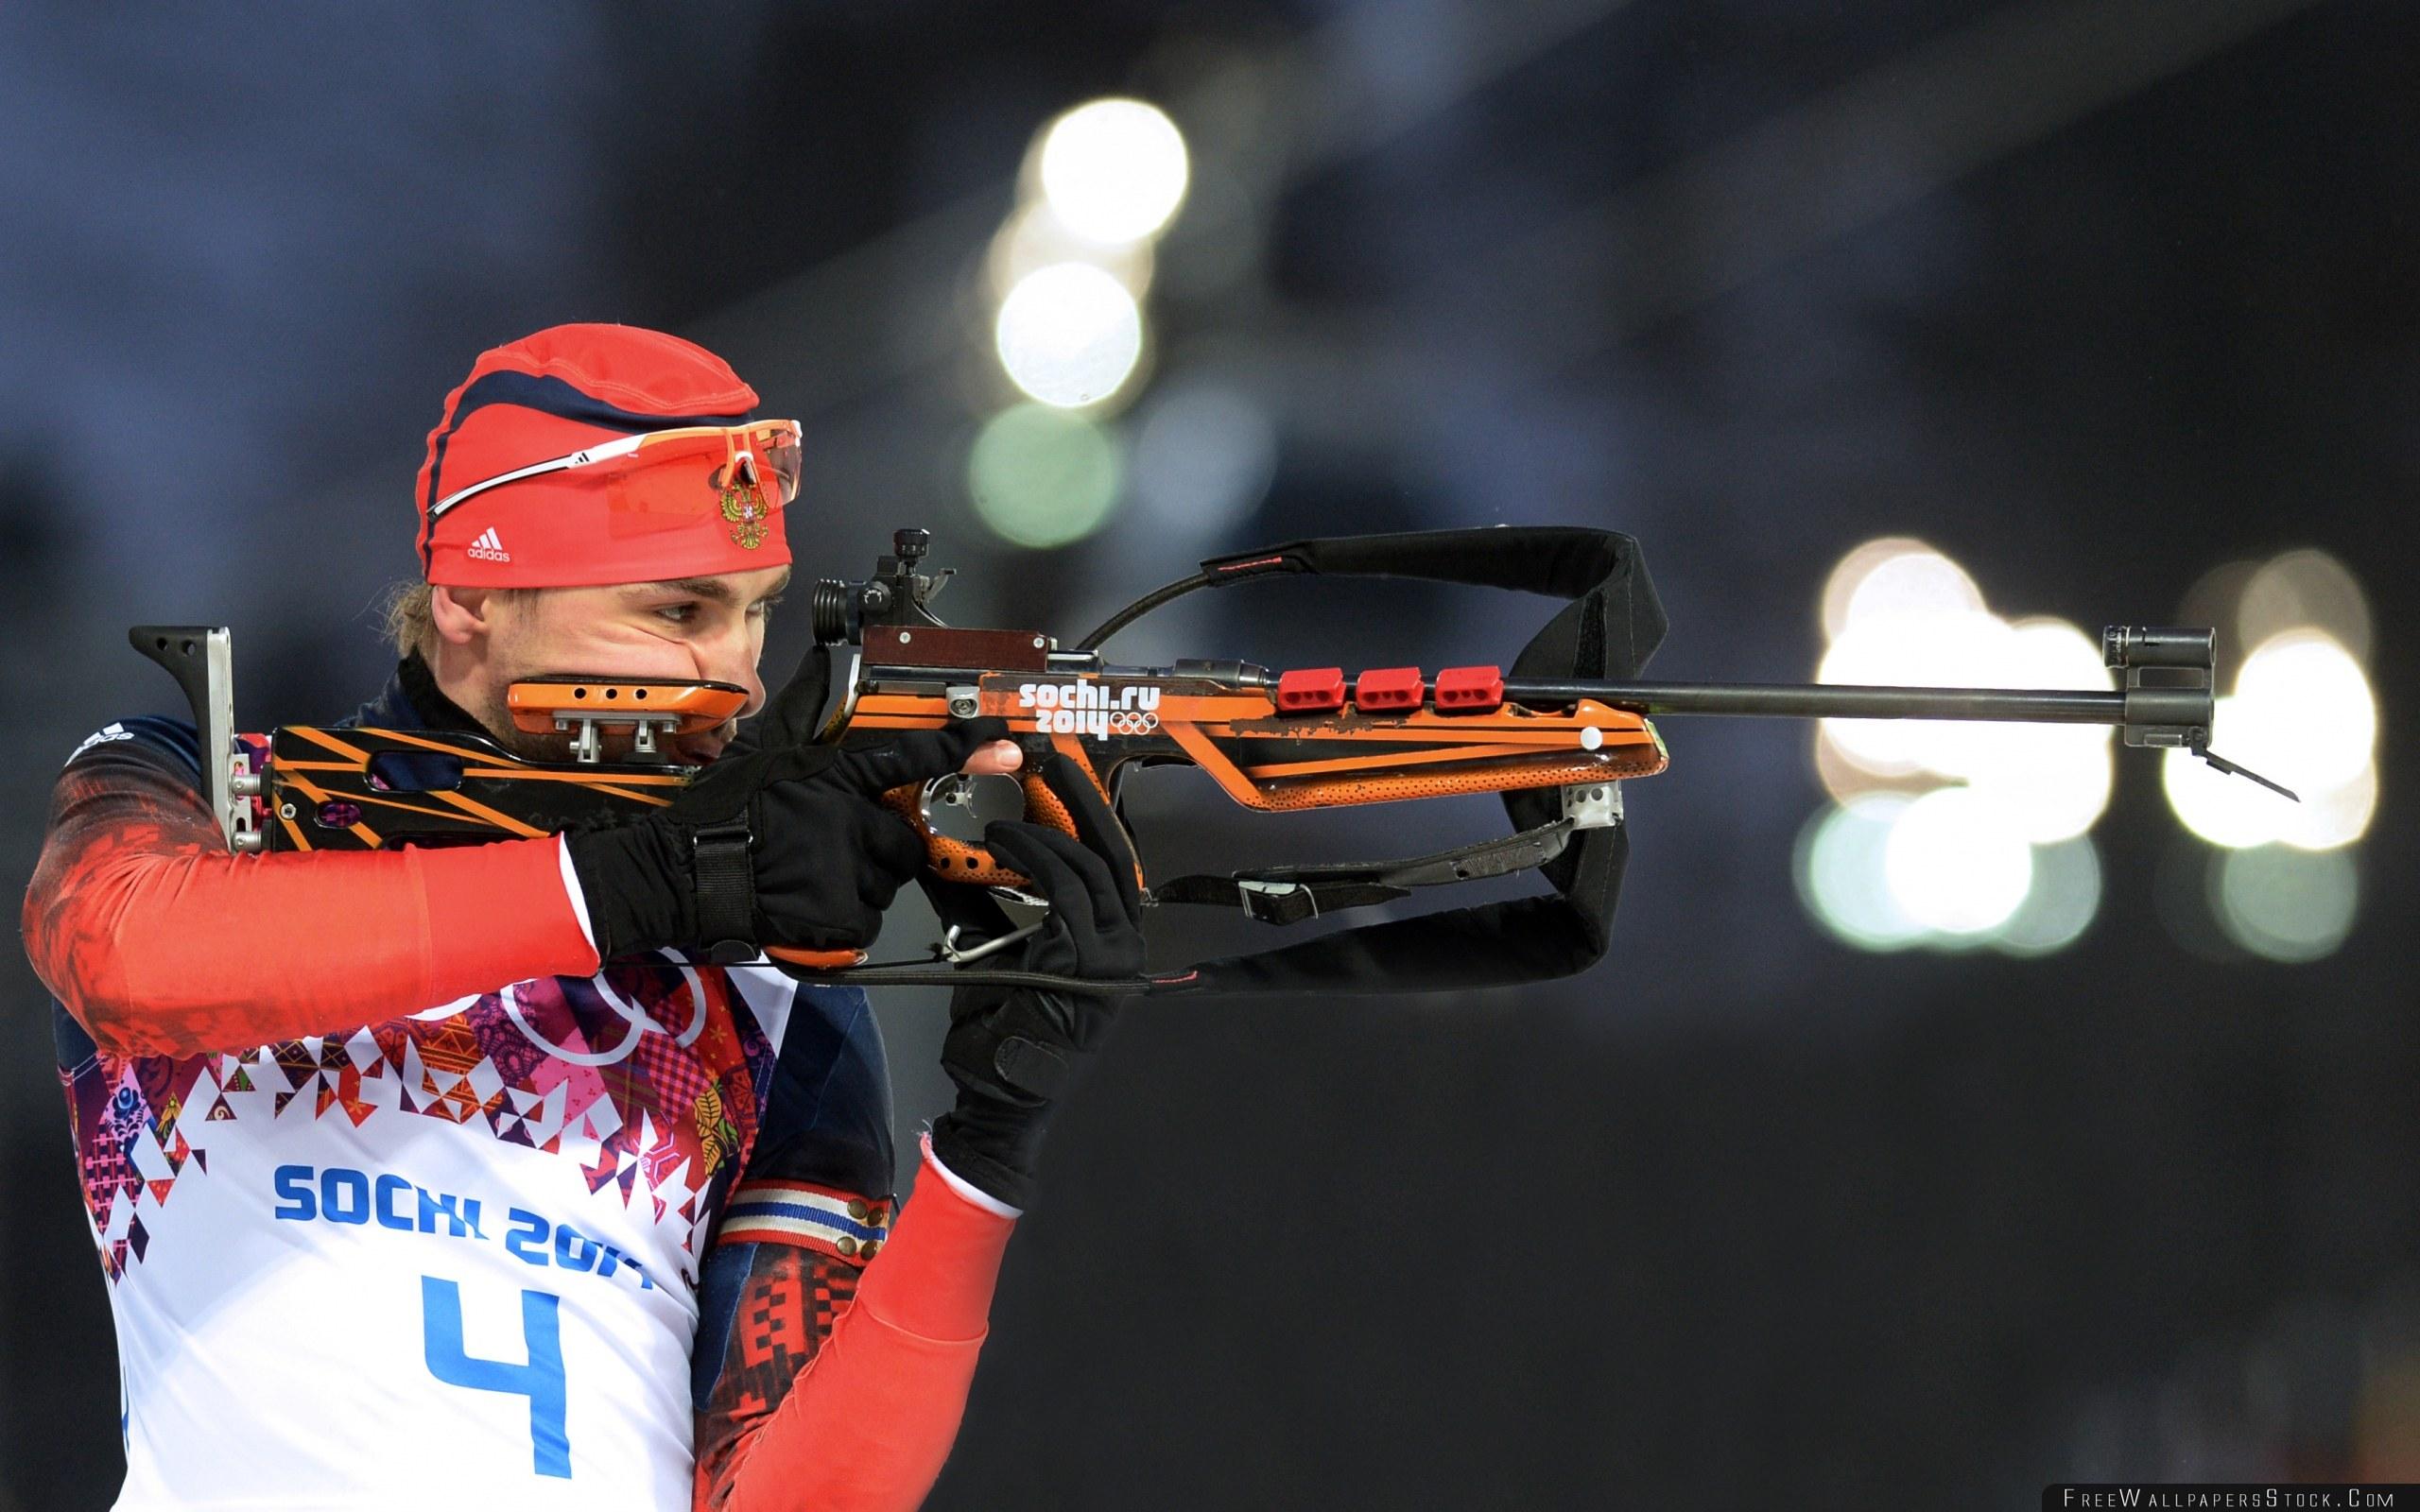 Download Free Wallpaper Anton Shipulin Biathlon Sochi Xxii Winter Olympic Games Russia